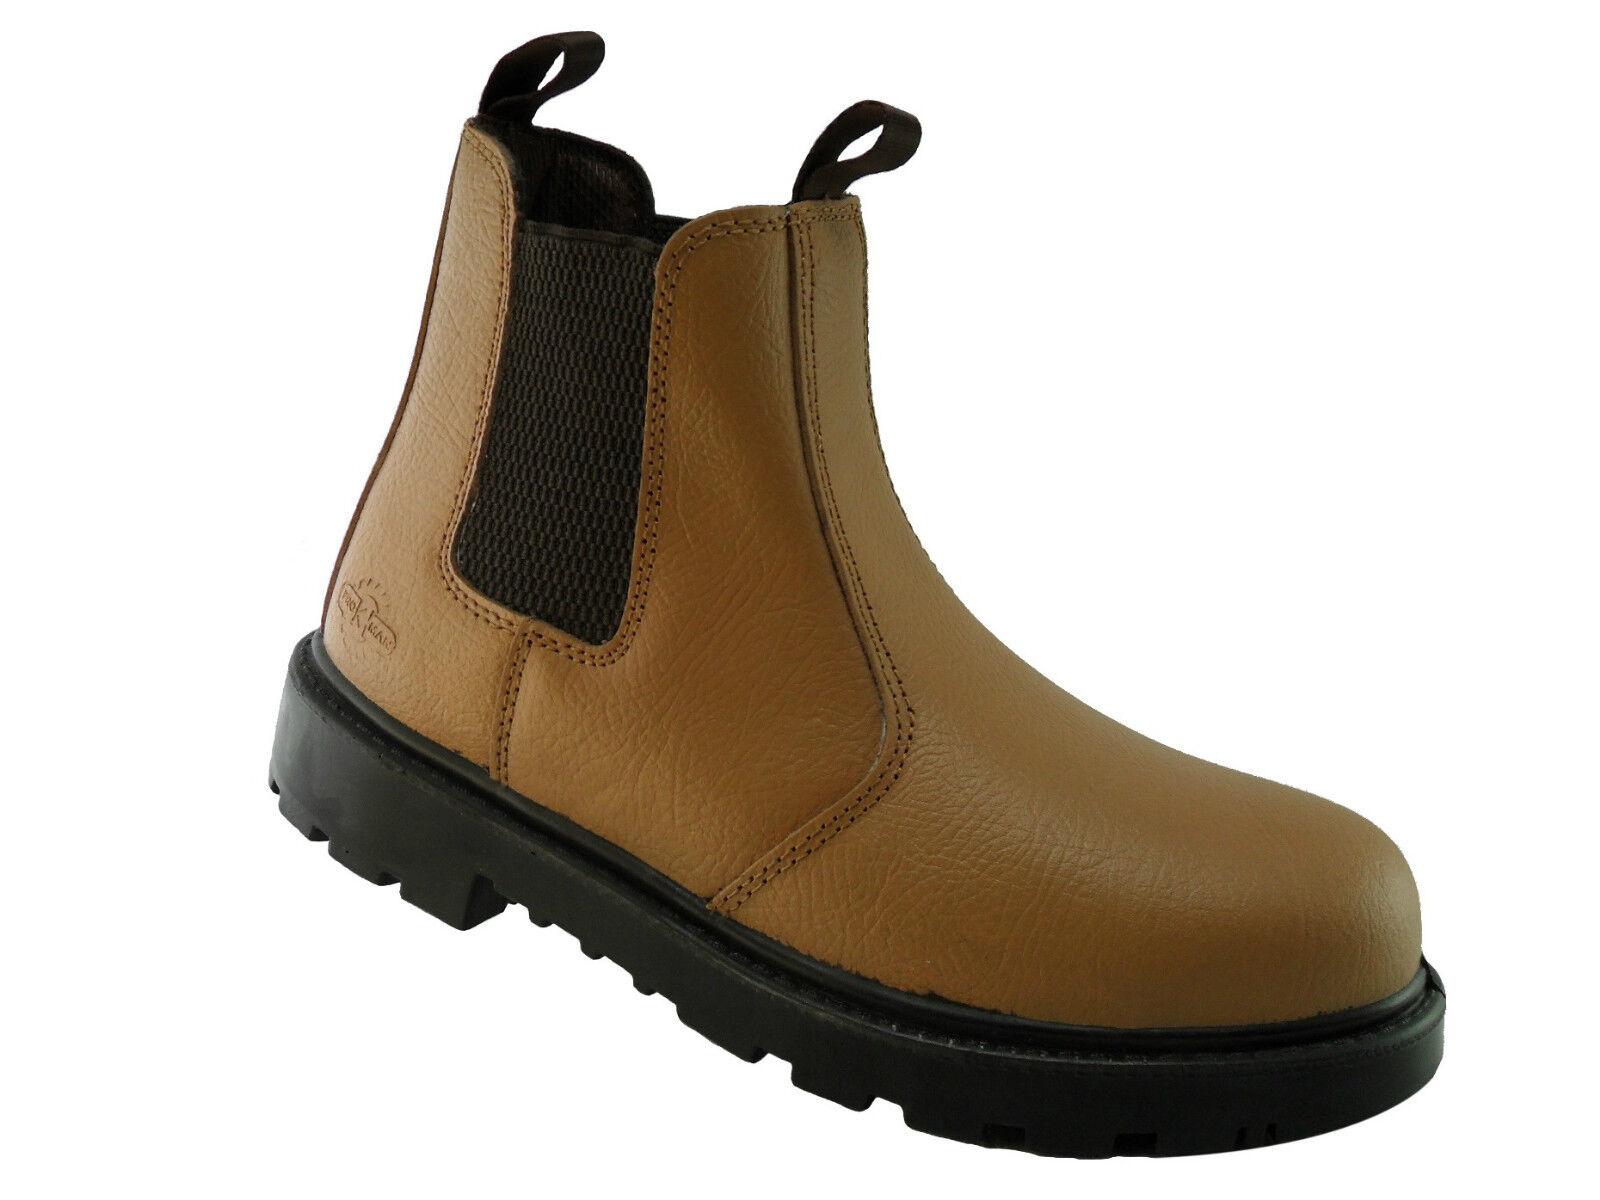 Pro Steel Man PM109C S1P Tan Steel Pro Toe Cap Chelsea Dealer Safety Boots Work Boots PPE 56104c